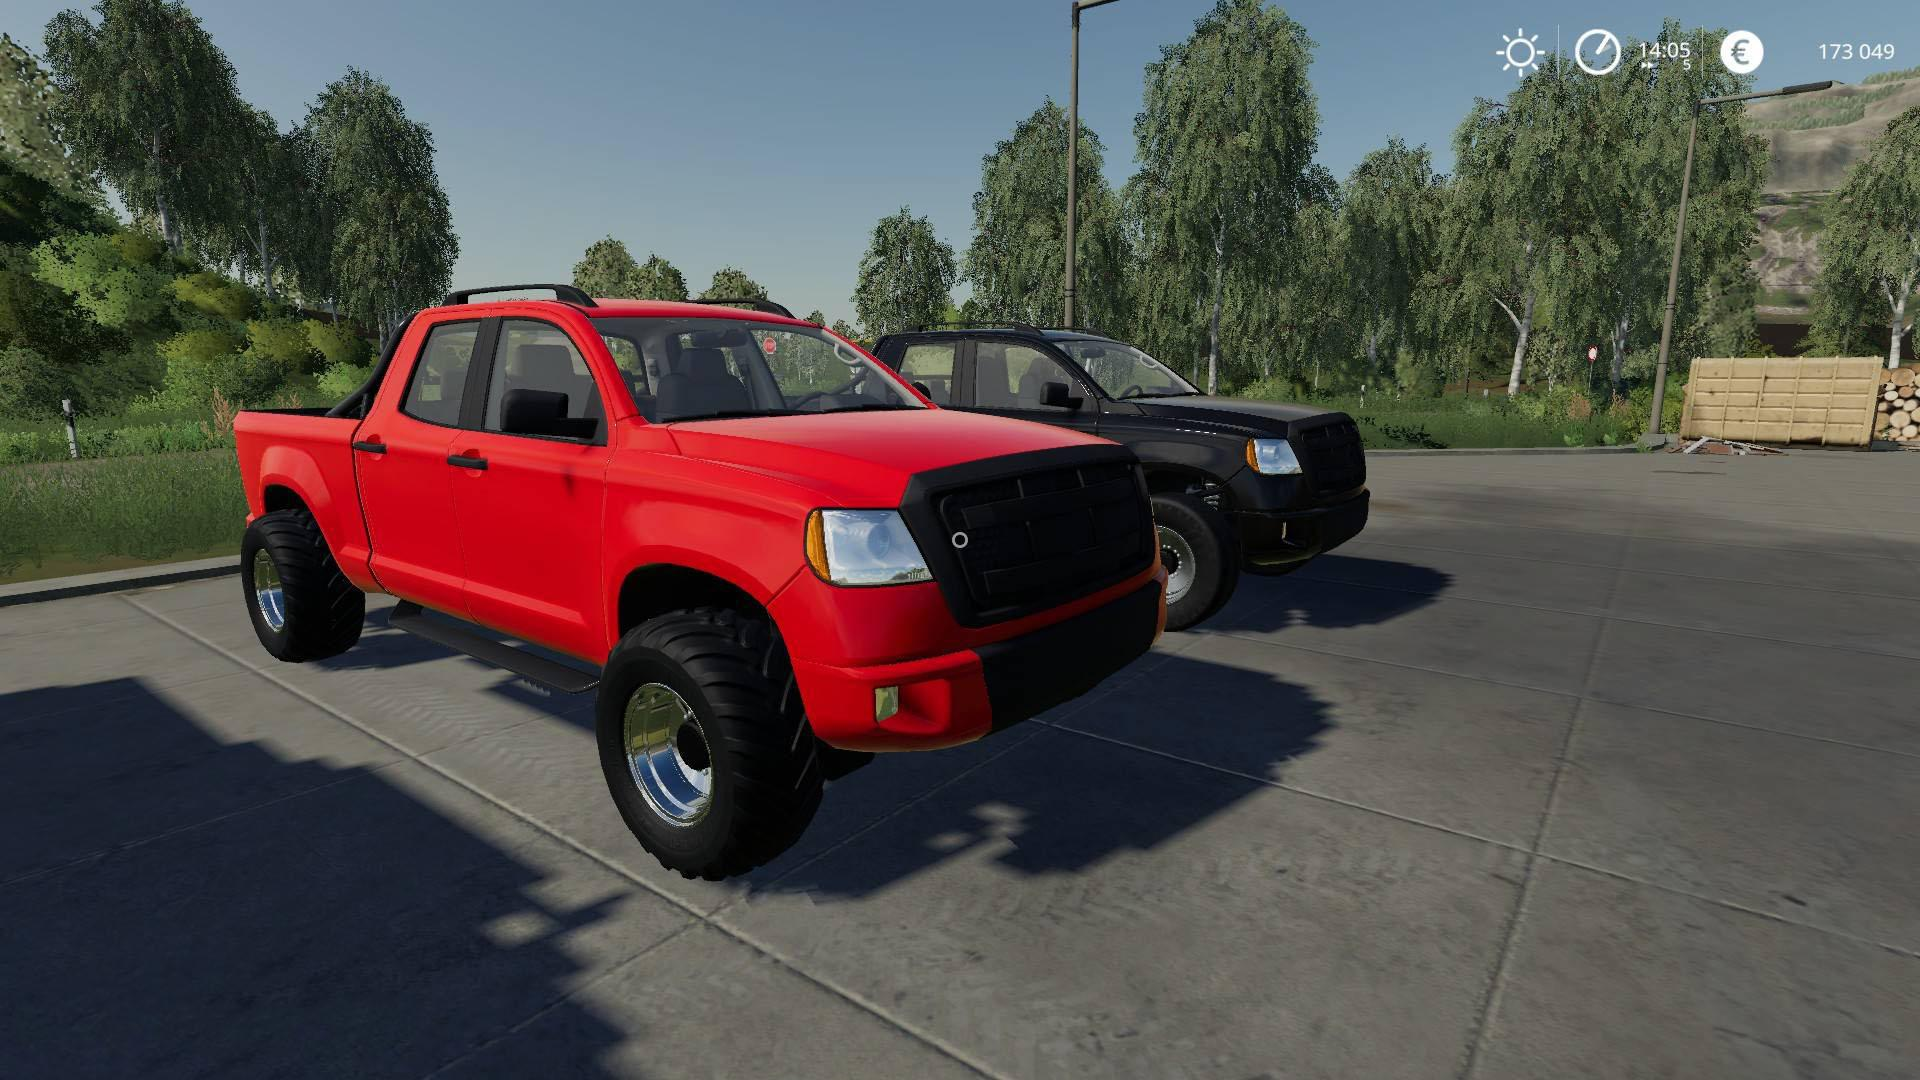 Pickup XM 2014 v1 0 FS19 - Farming Simulator 19 Mod | FS19 mod